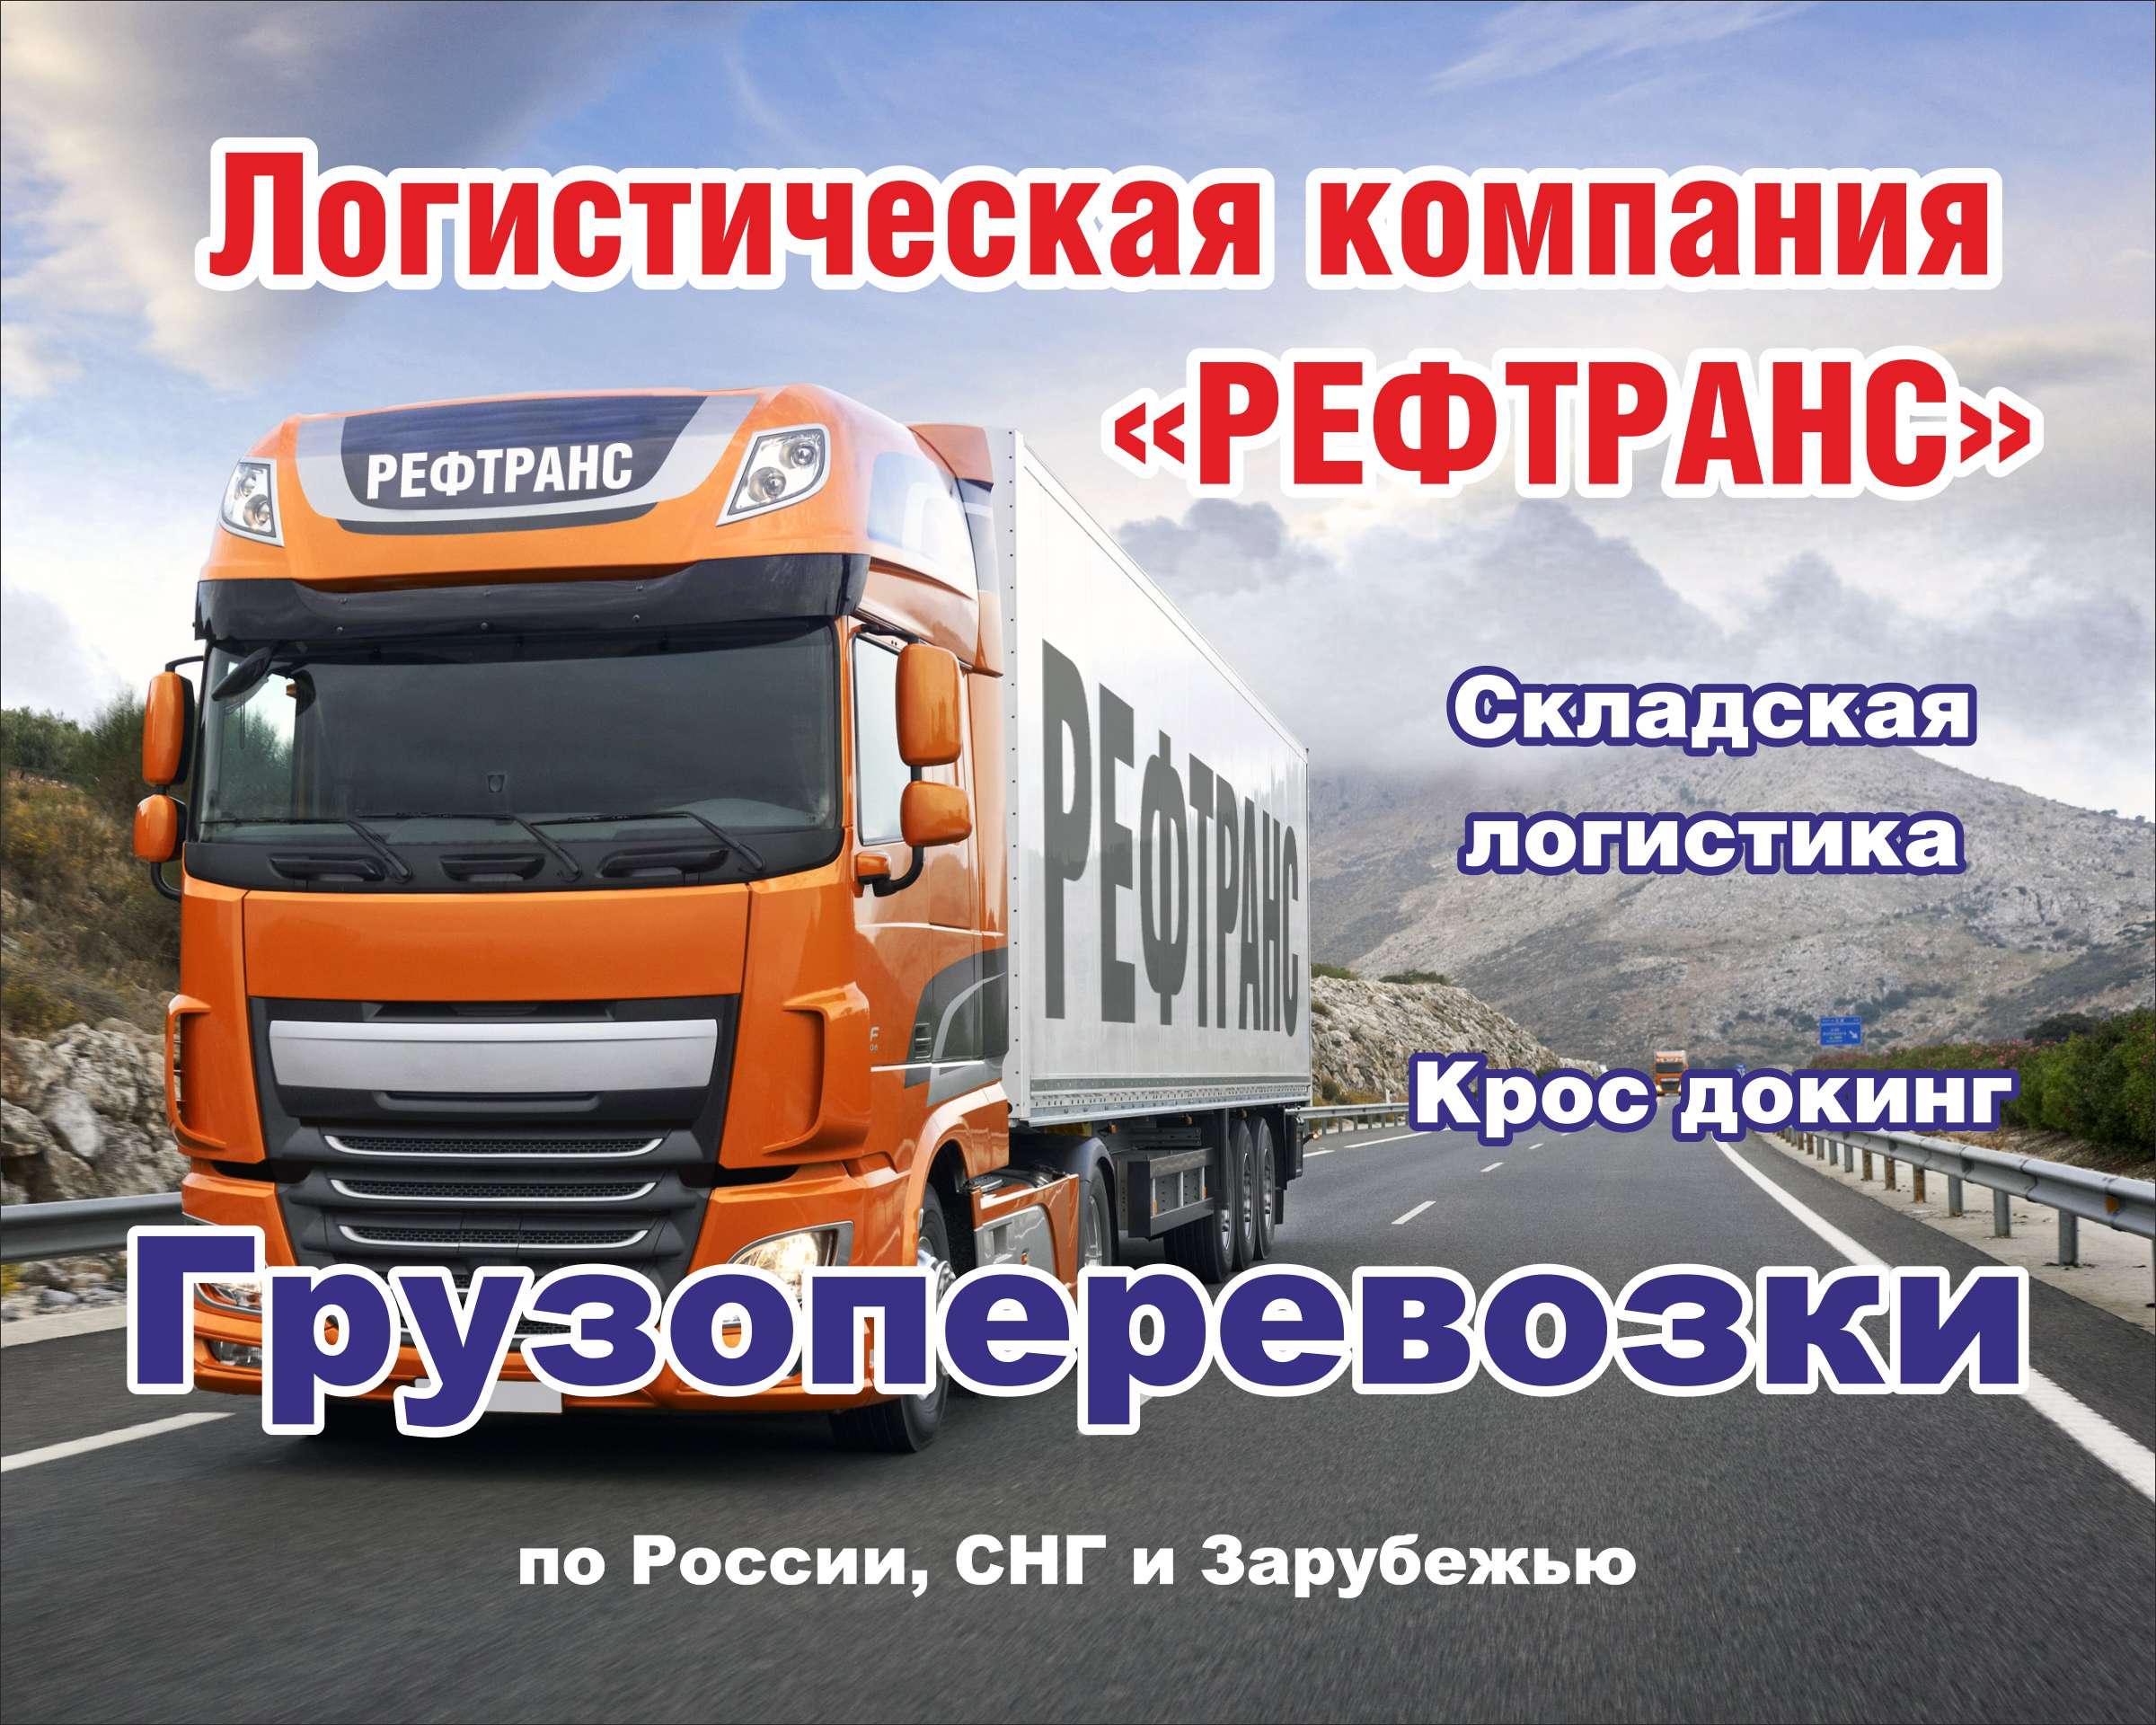 Грузоперевозки по России и за Рубеж